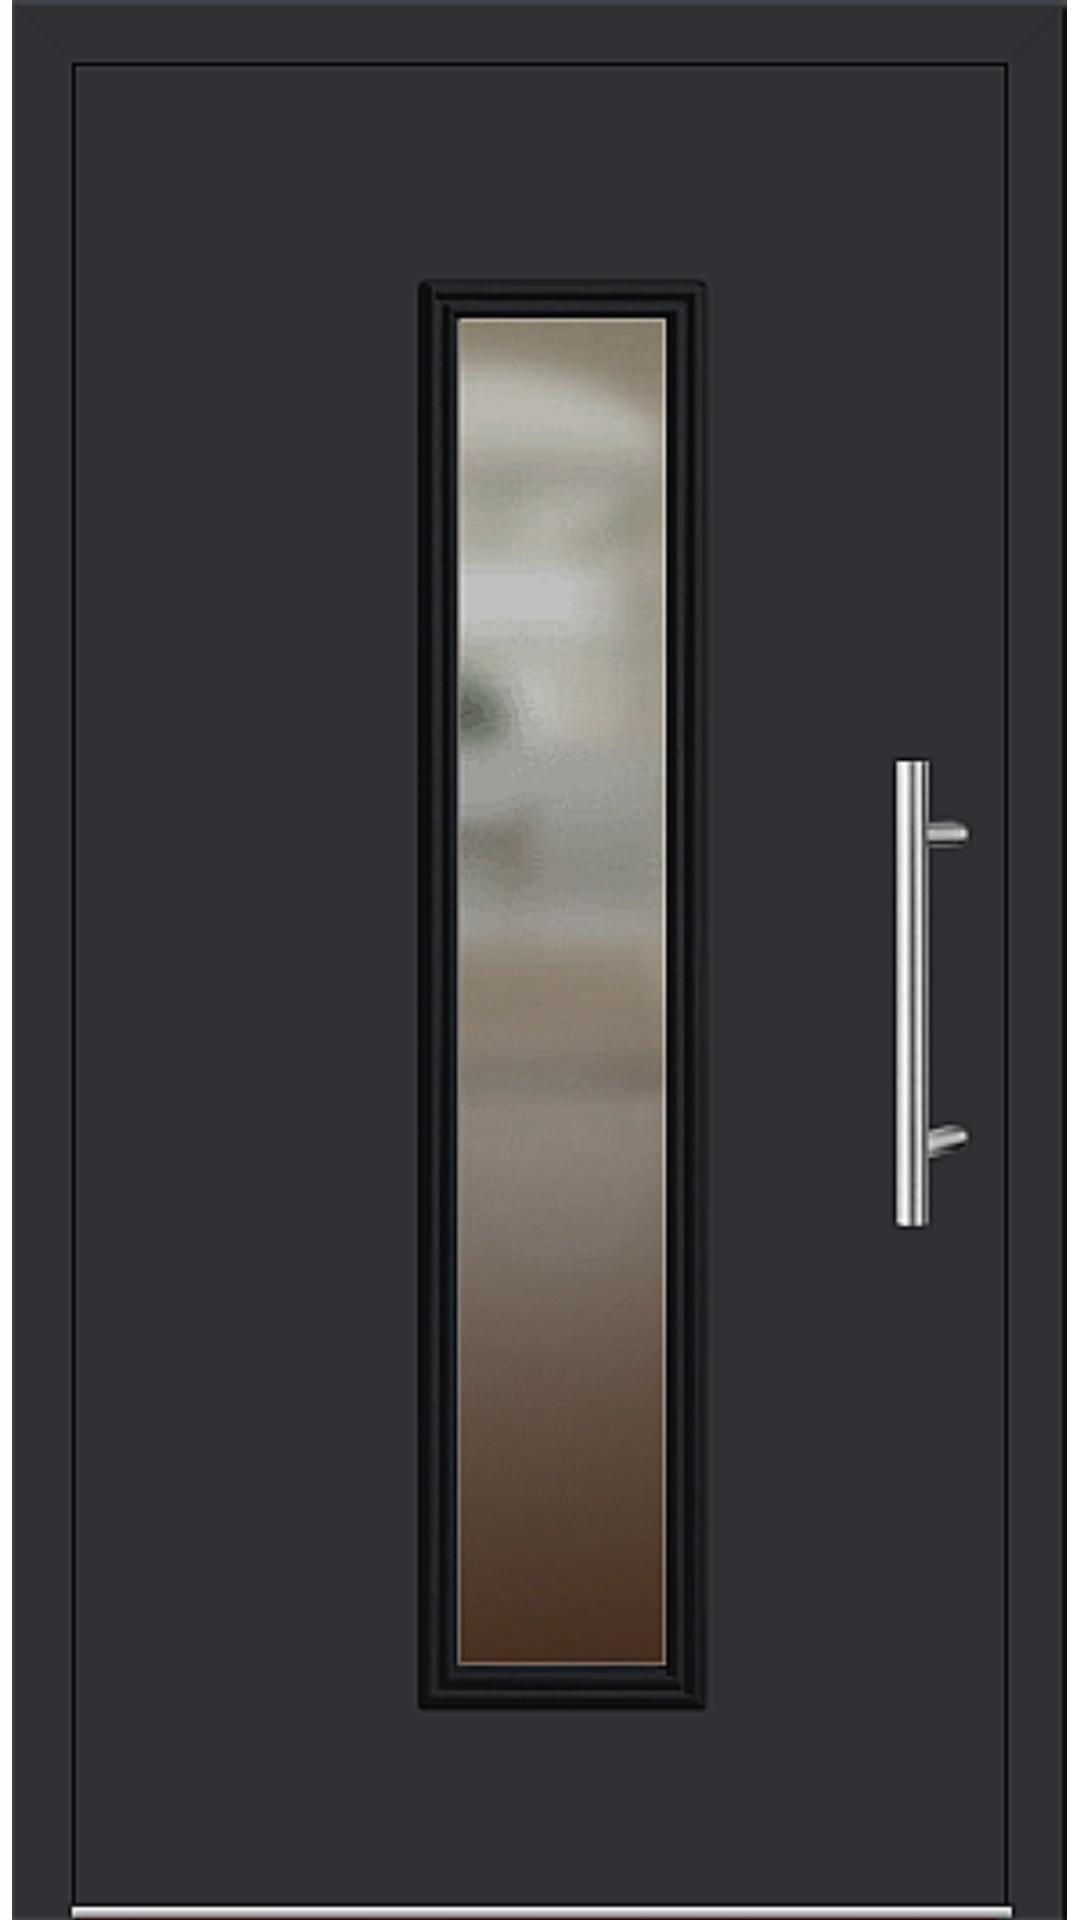 Aluminium Haustür Modell 6921-60 schwarz